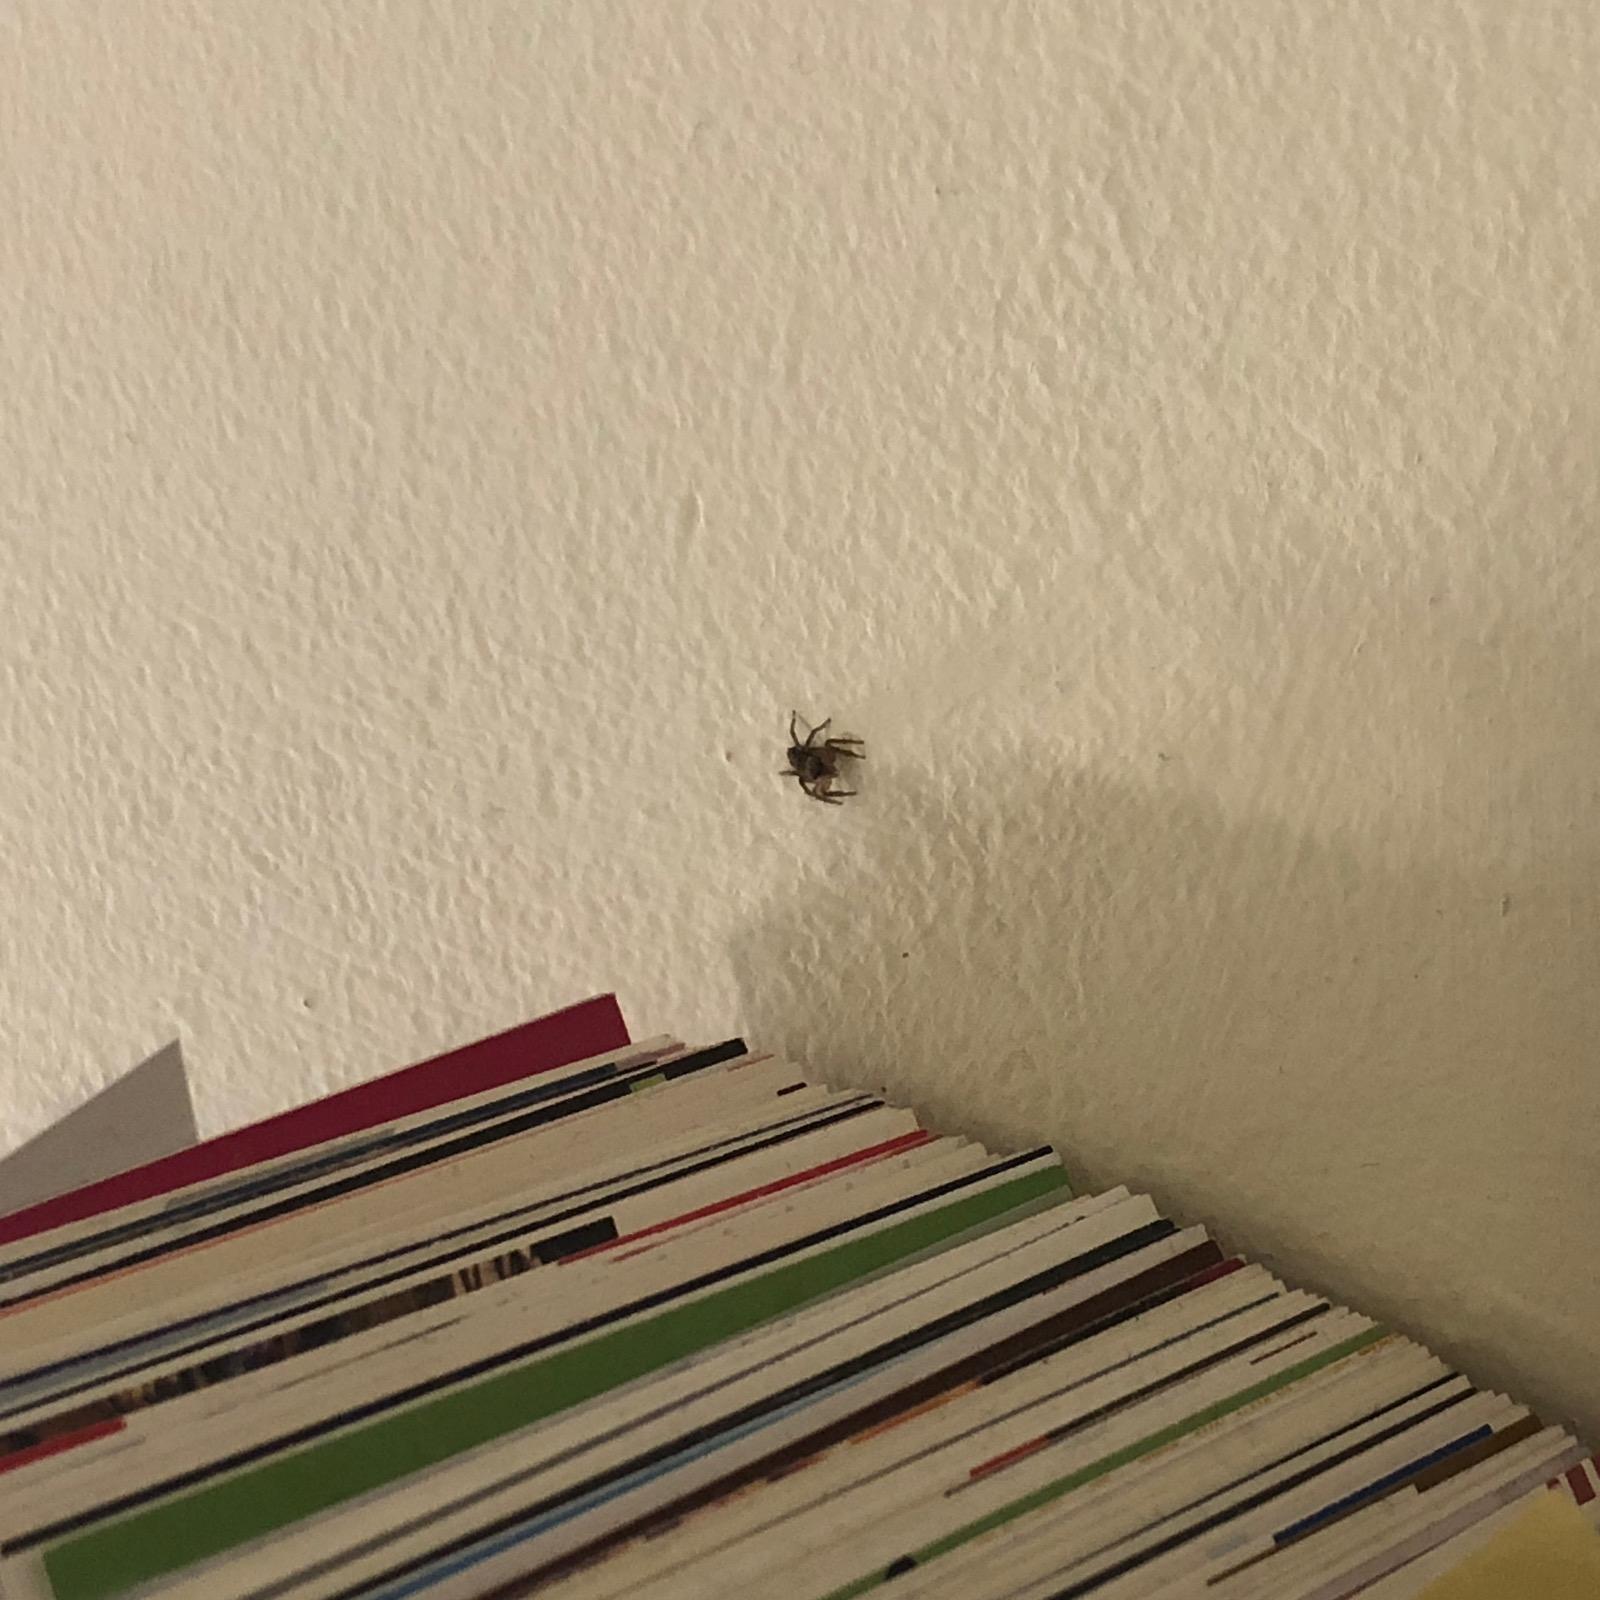 iPhoneX等倍で蜘蛛を撮る